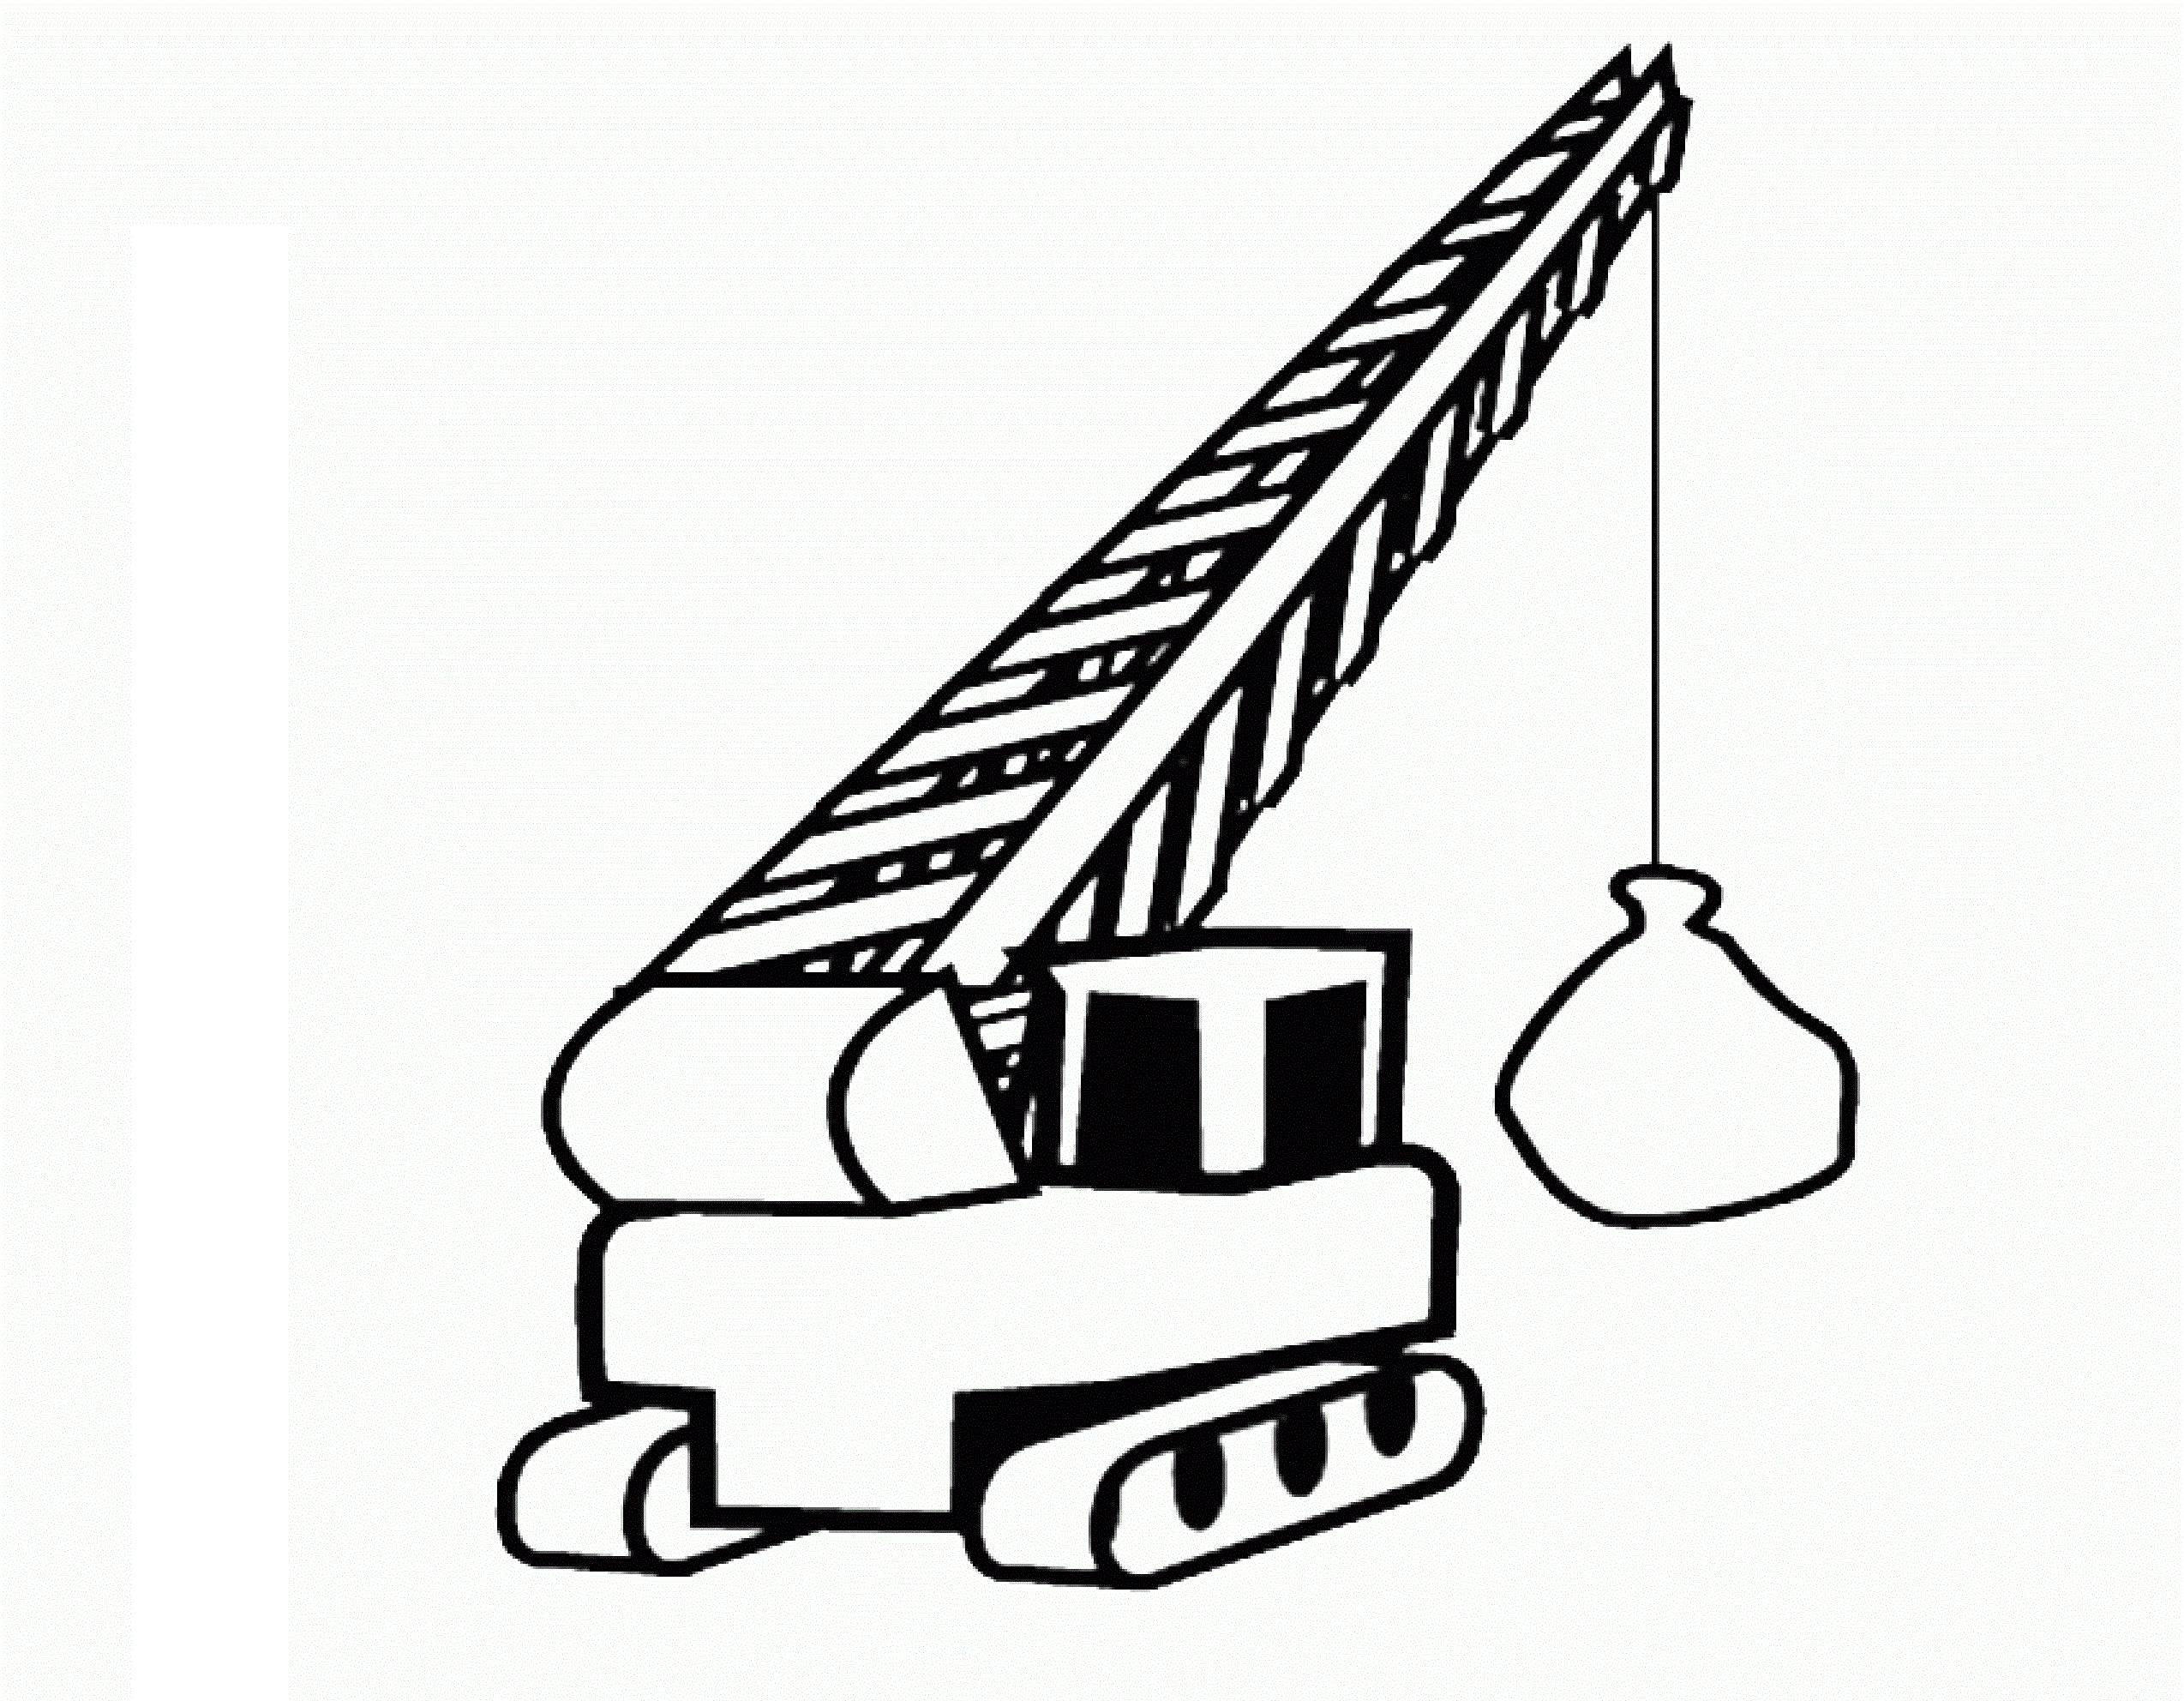 Раскраска экскаватор с шаром на vipraskraski.ru